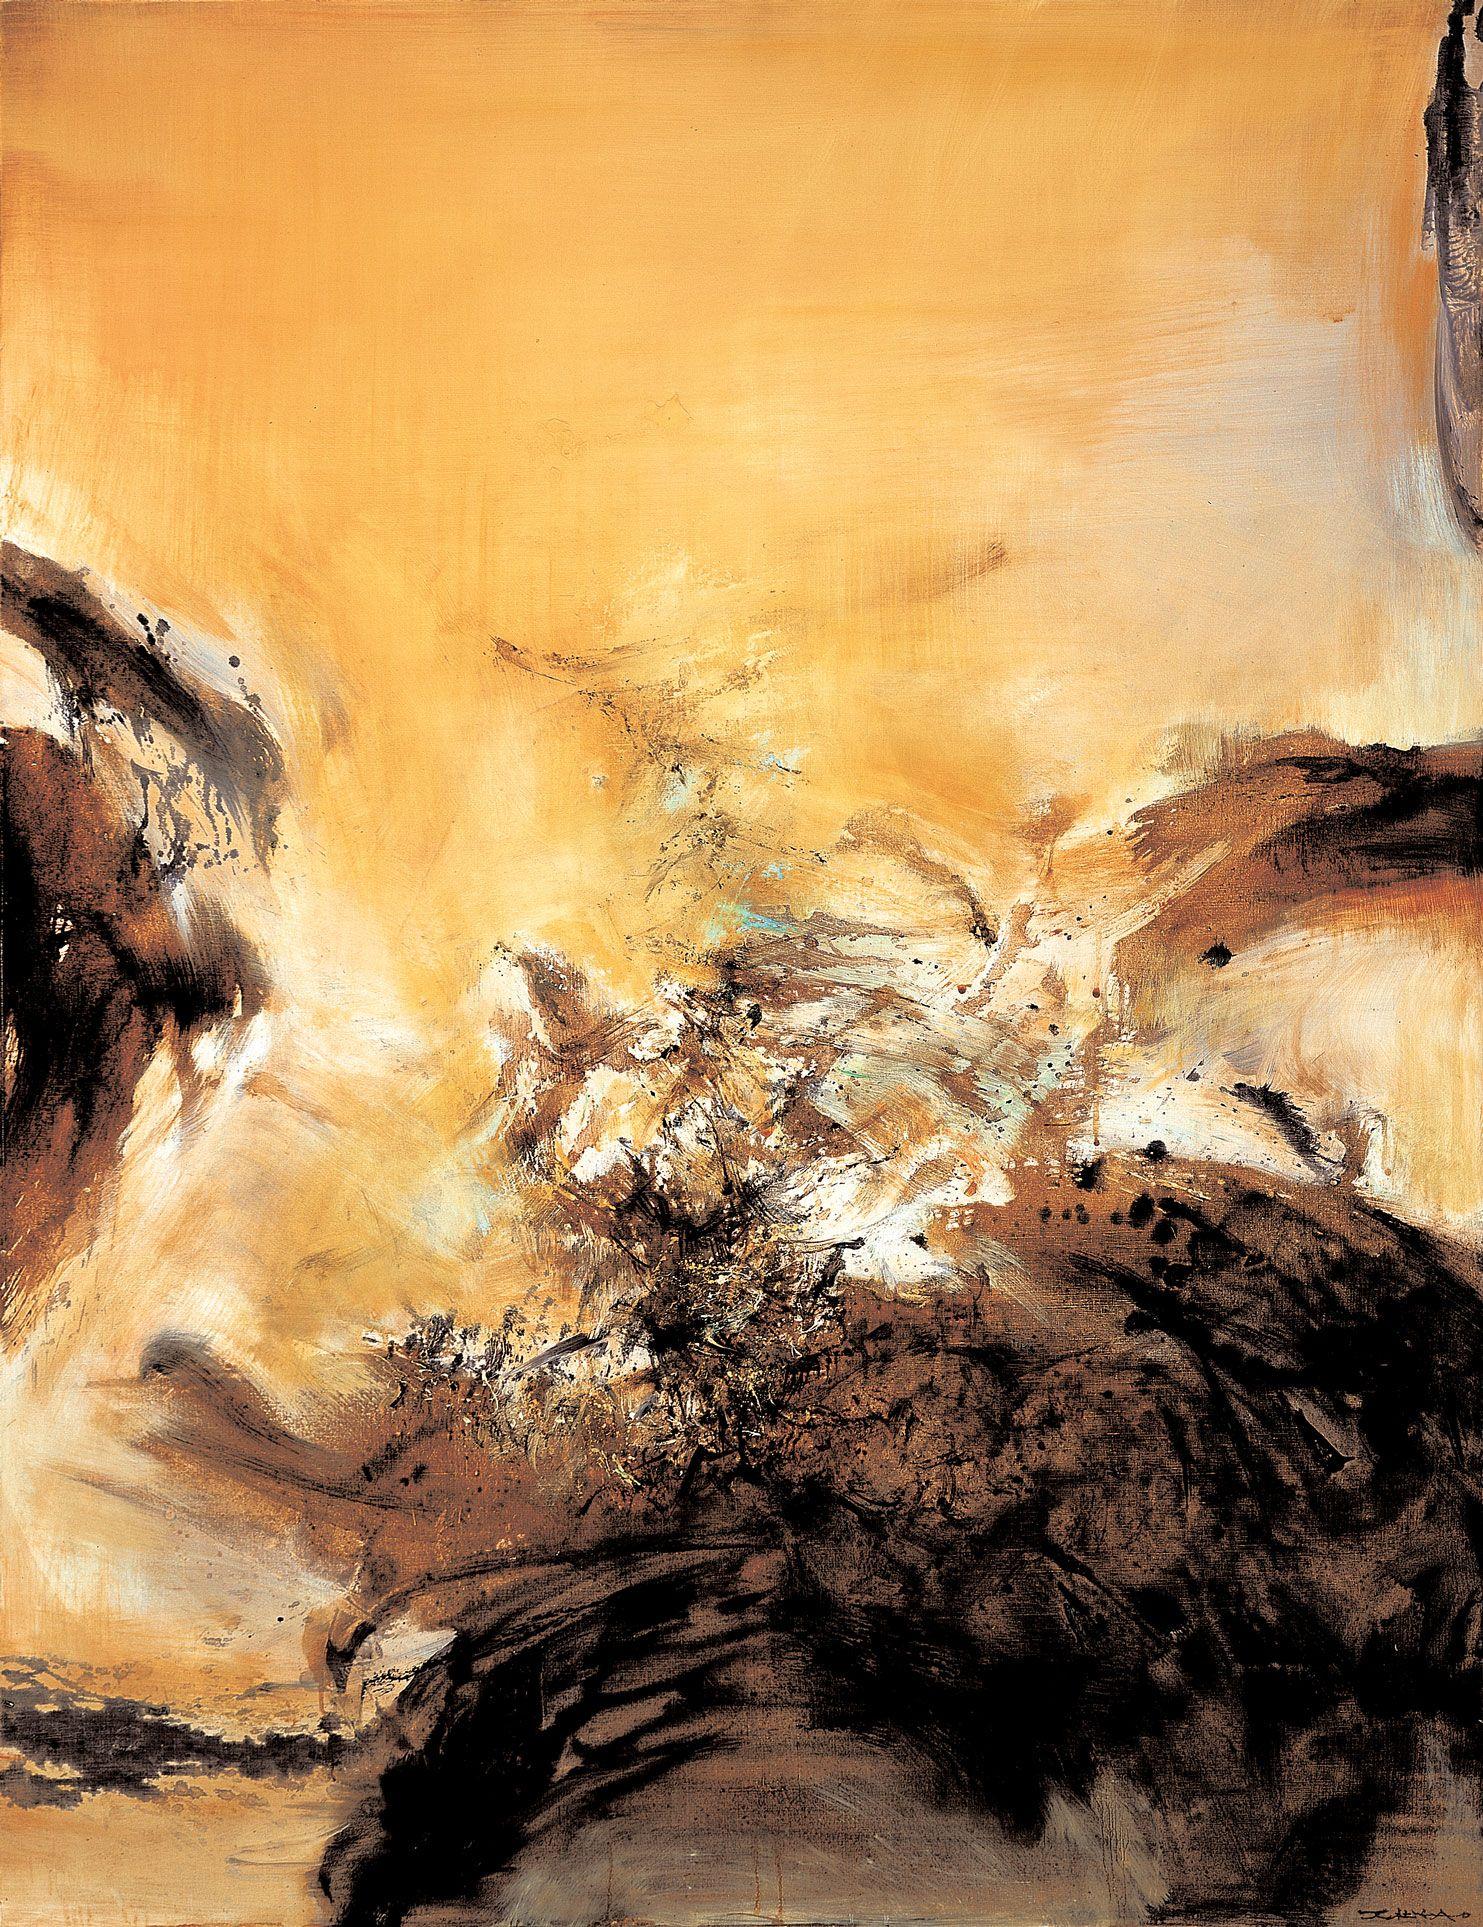 Zao Wou Ki 28 4 75 1975 Oil On Canvas 116 X 89 Cm Hong Kong